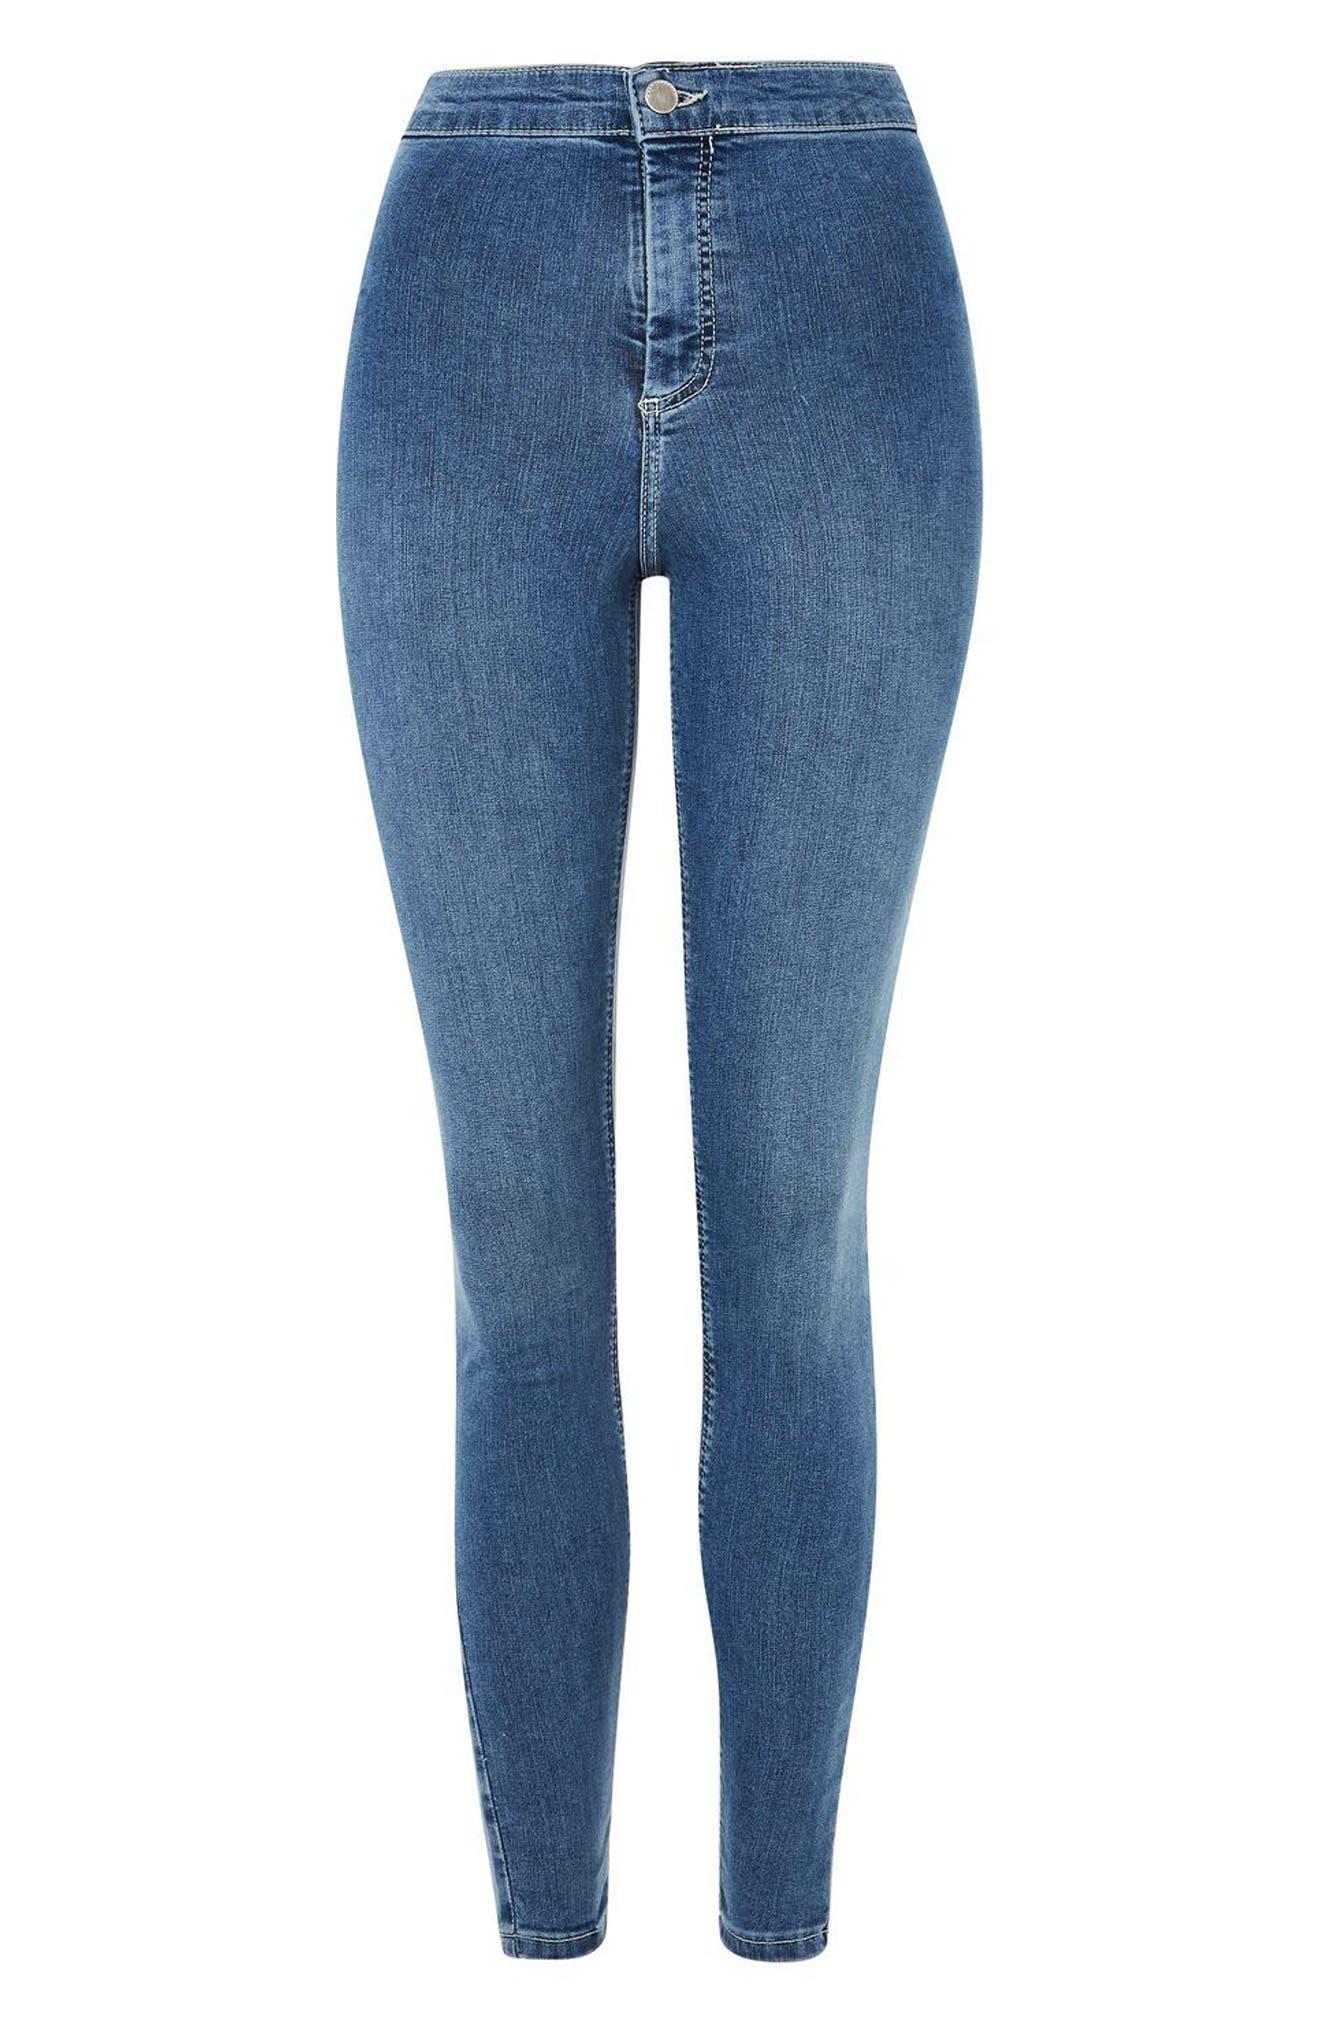 Joni Contrast Stitch High Rise Skinny Jeans,                             Alternate thumbnail 4, color,                             400